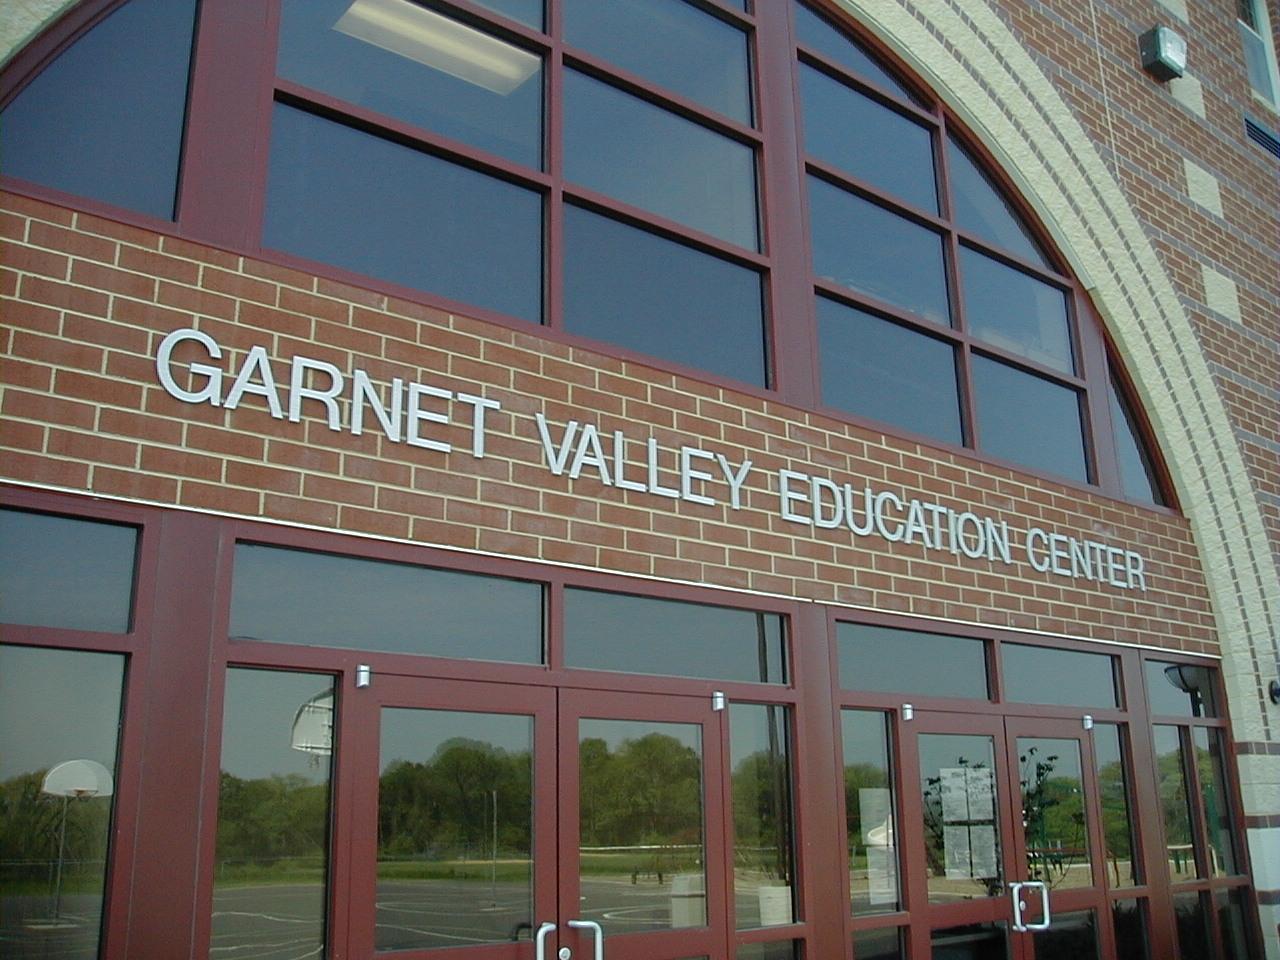 Delaware County Public Schools to Close for One Day to Test Preparedness for Coronavirus